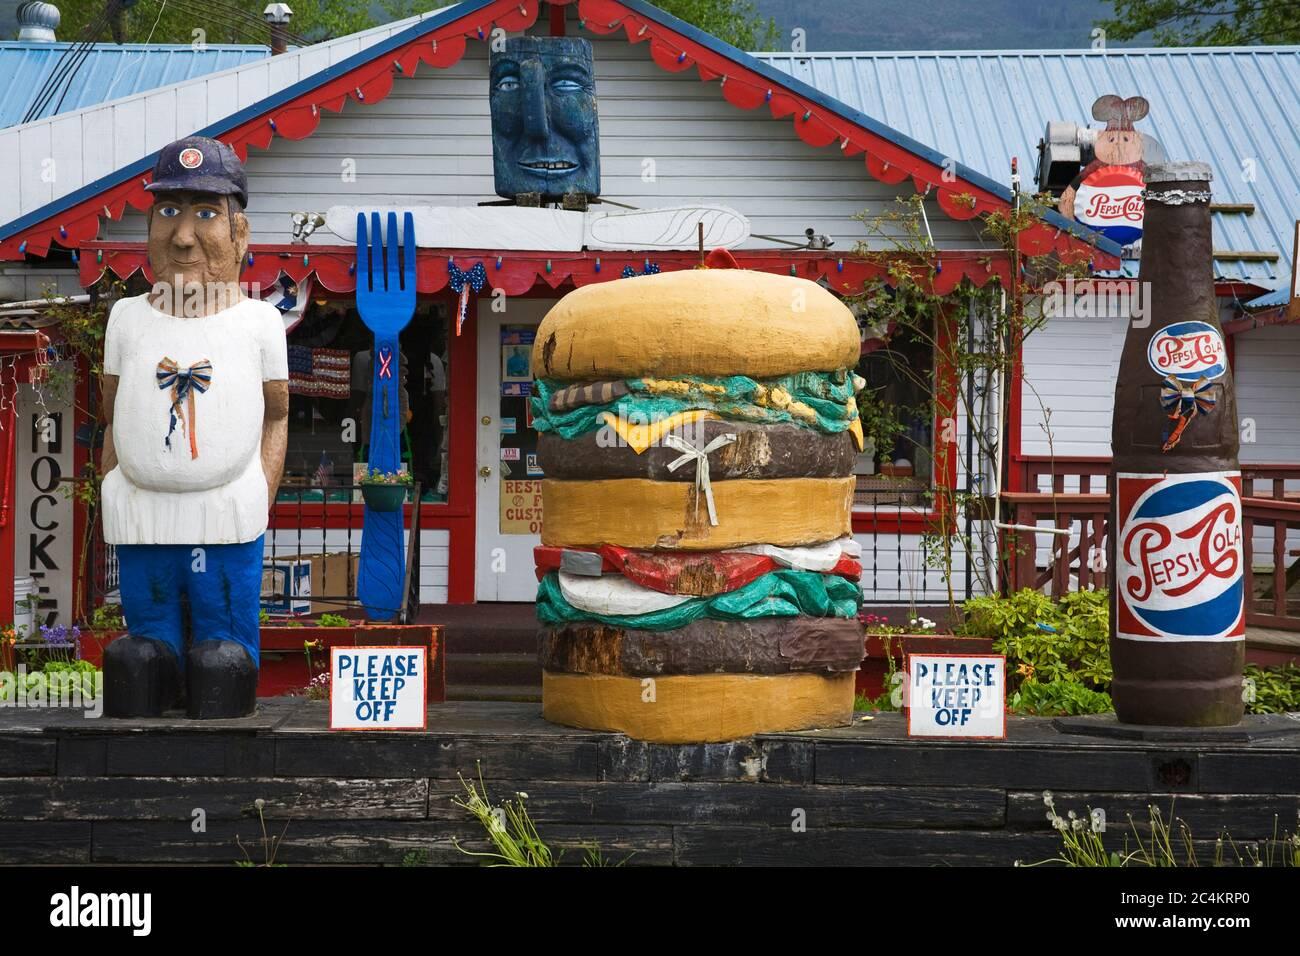 Fat Smitty S Restaurant Discovery Bay Washington State Usa Stock Photo Alamy